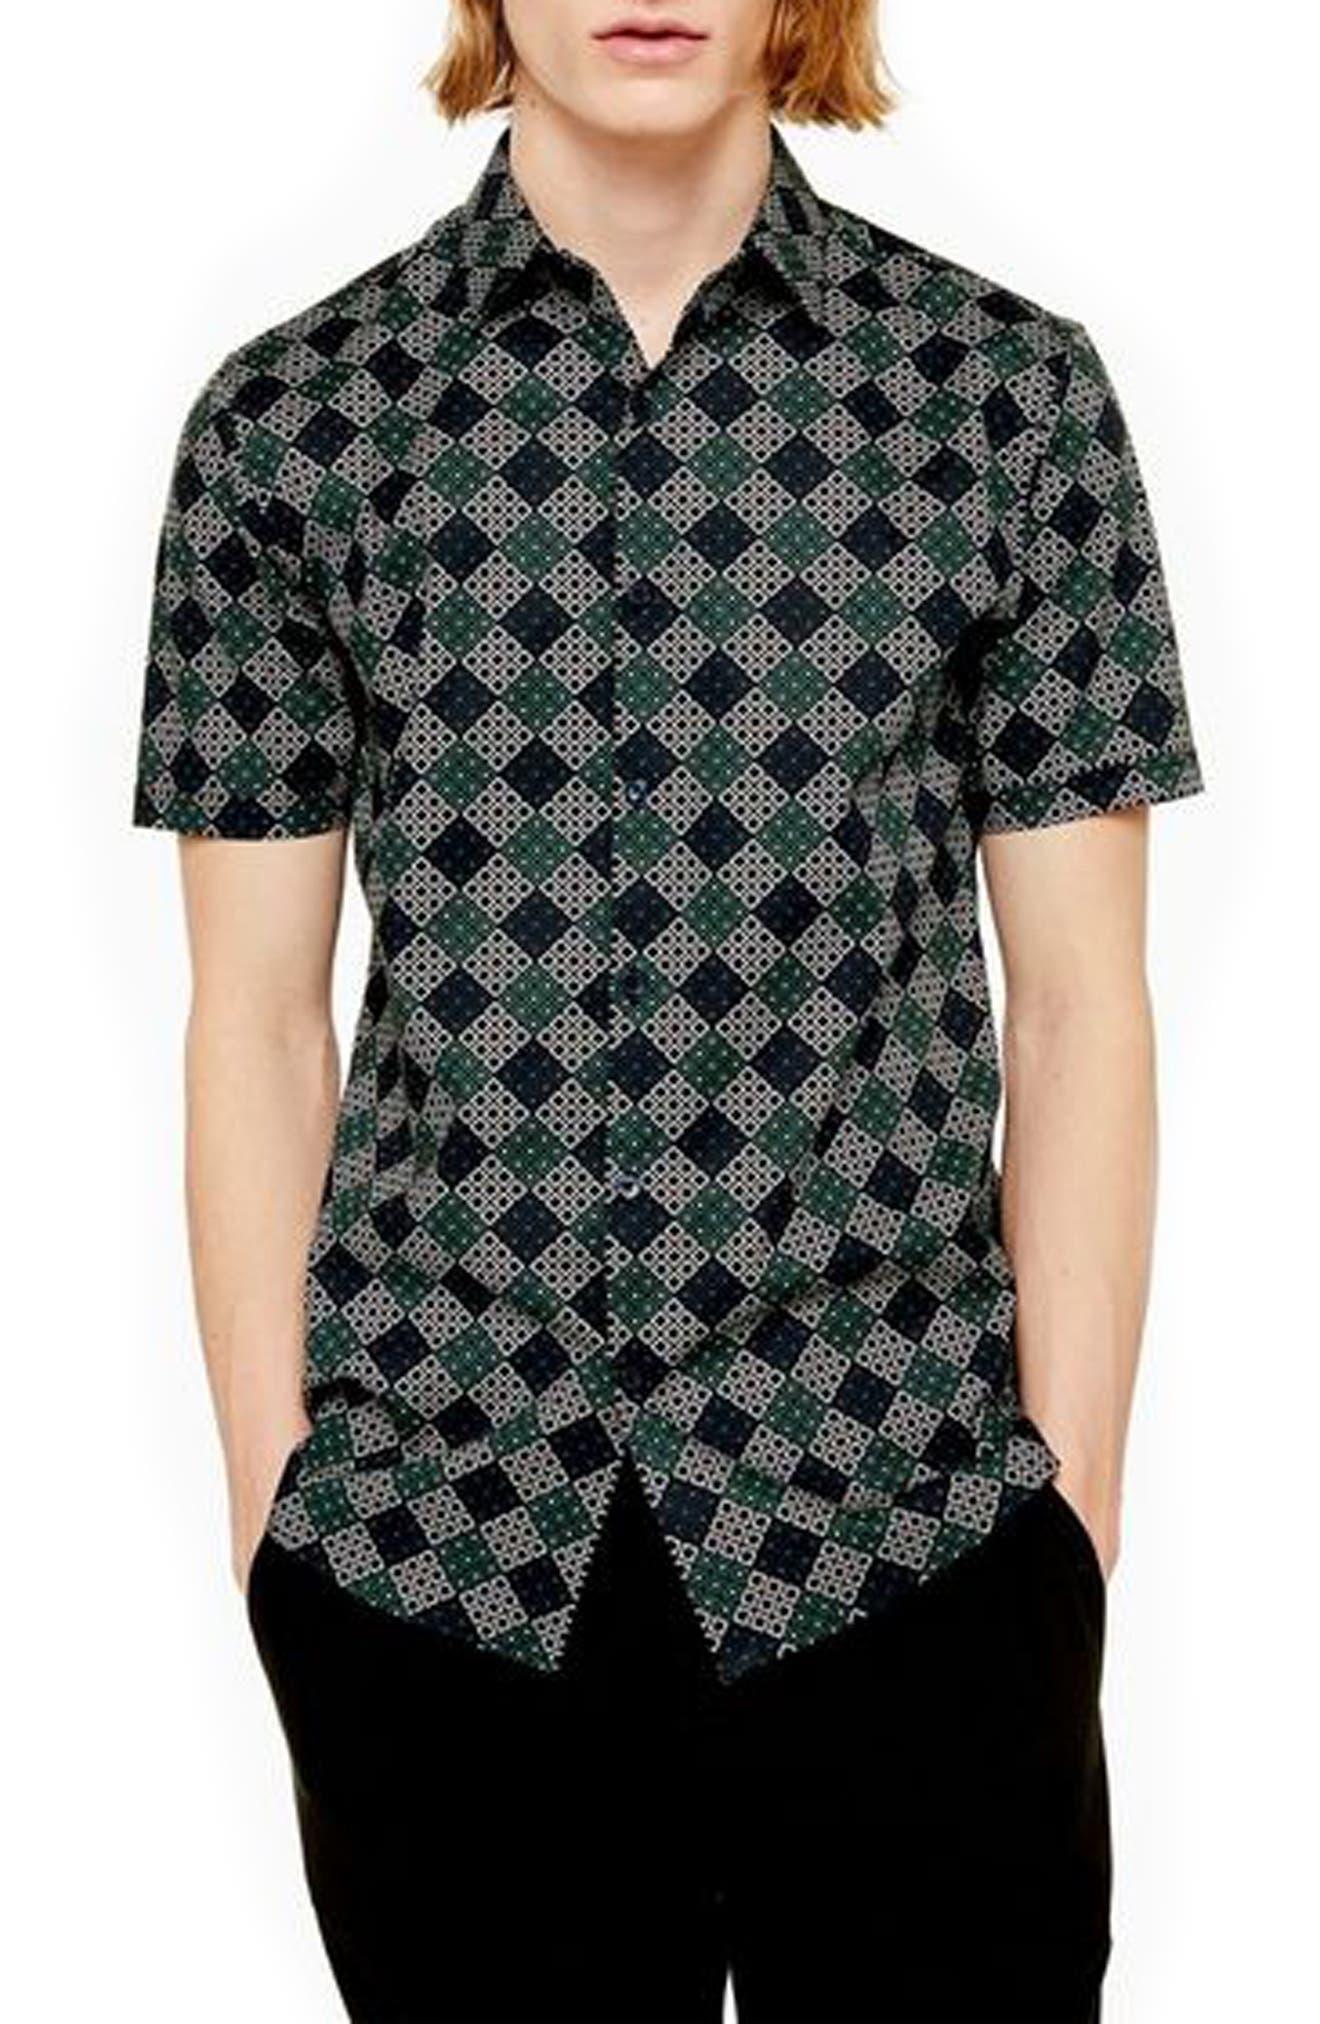 Retro Clothing for Men | Vintage Men's Fashion Mens Topman Trim Fit Geometric Print Short Sleeve Button-Up Shirt $55.00 AT vintagedancer.com